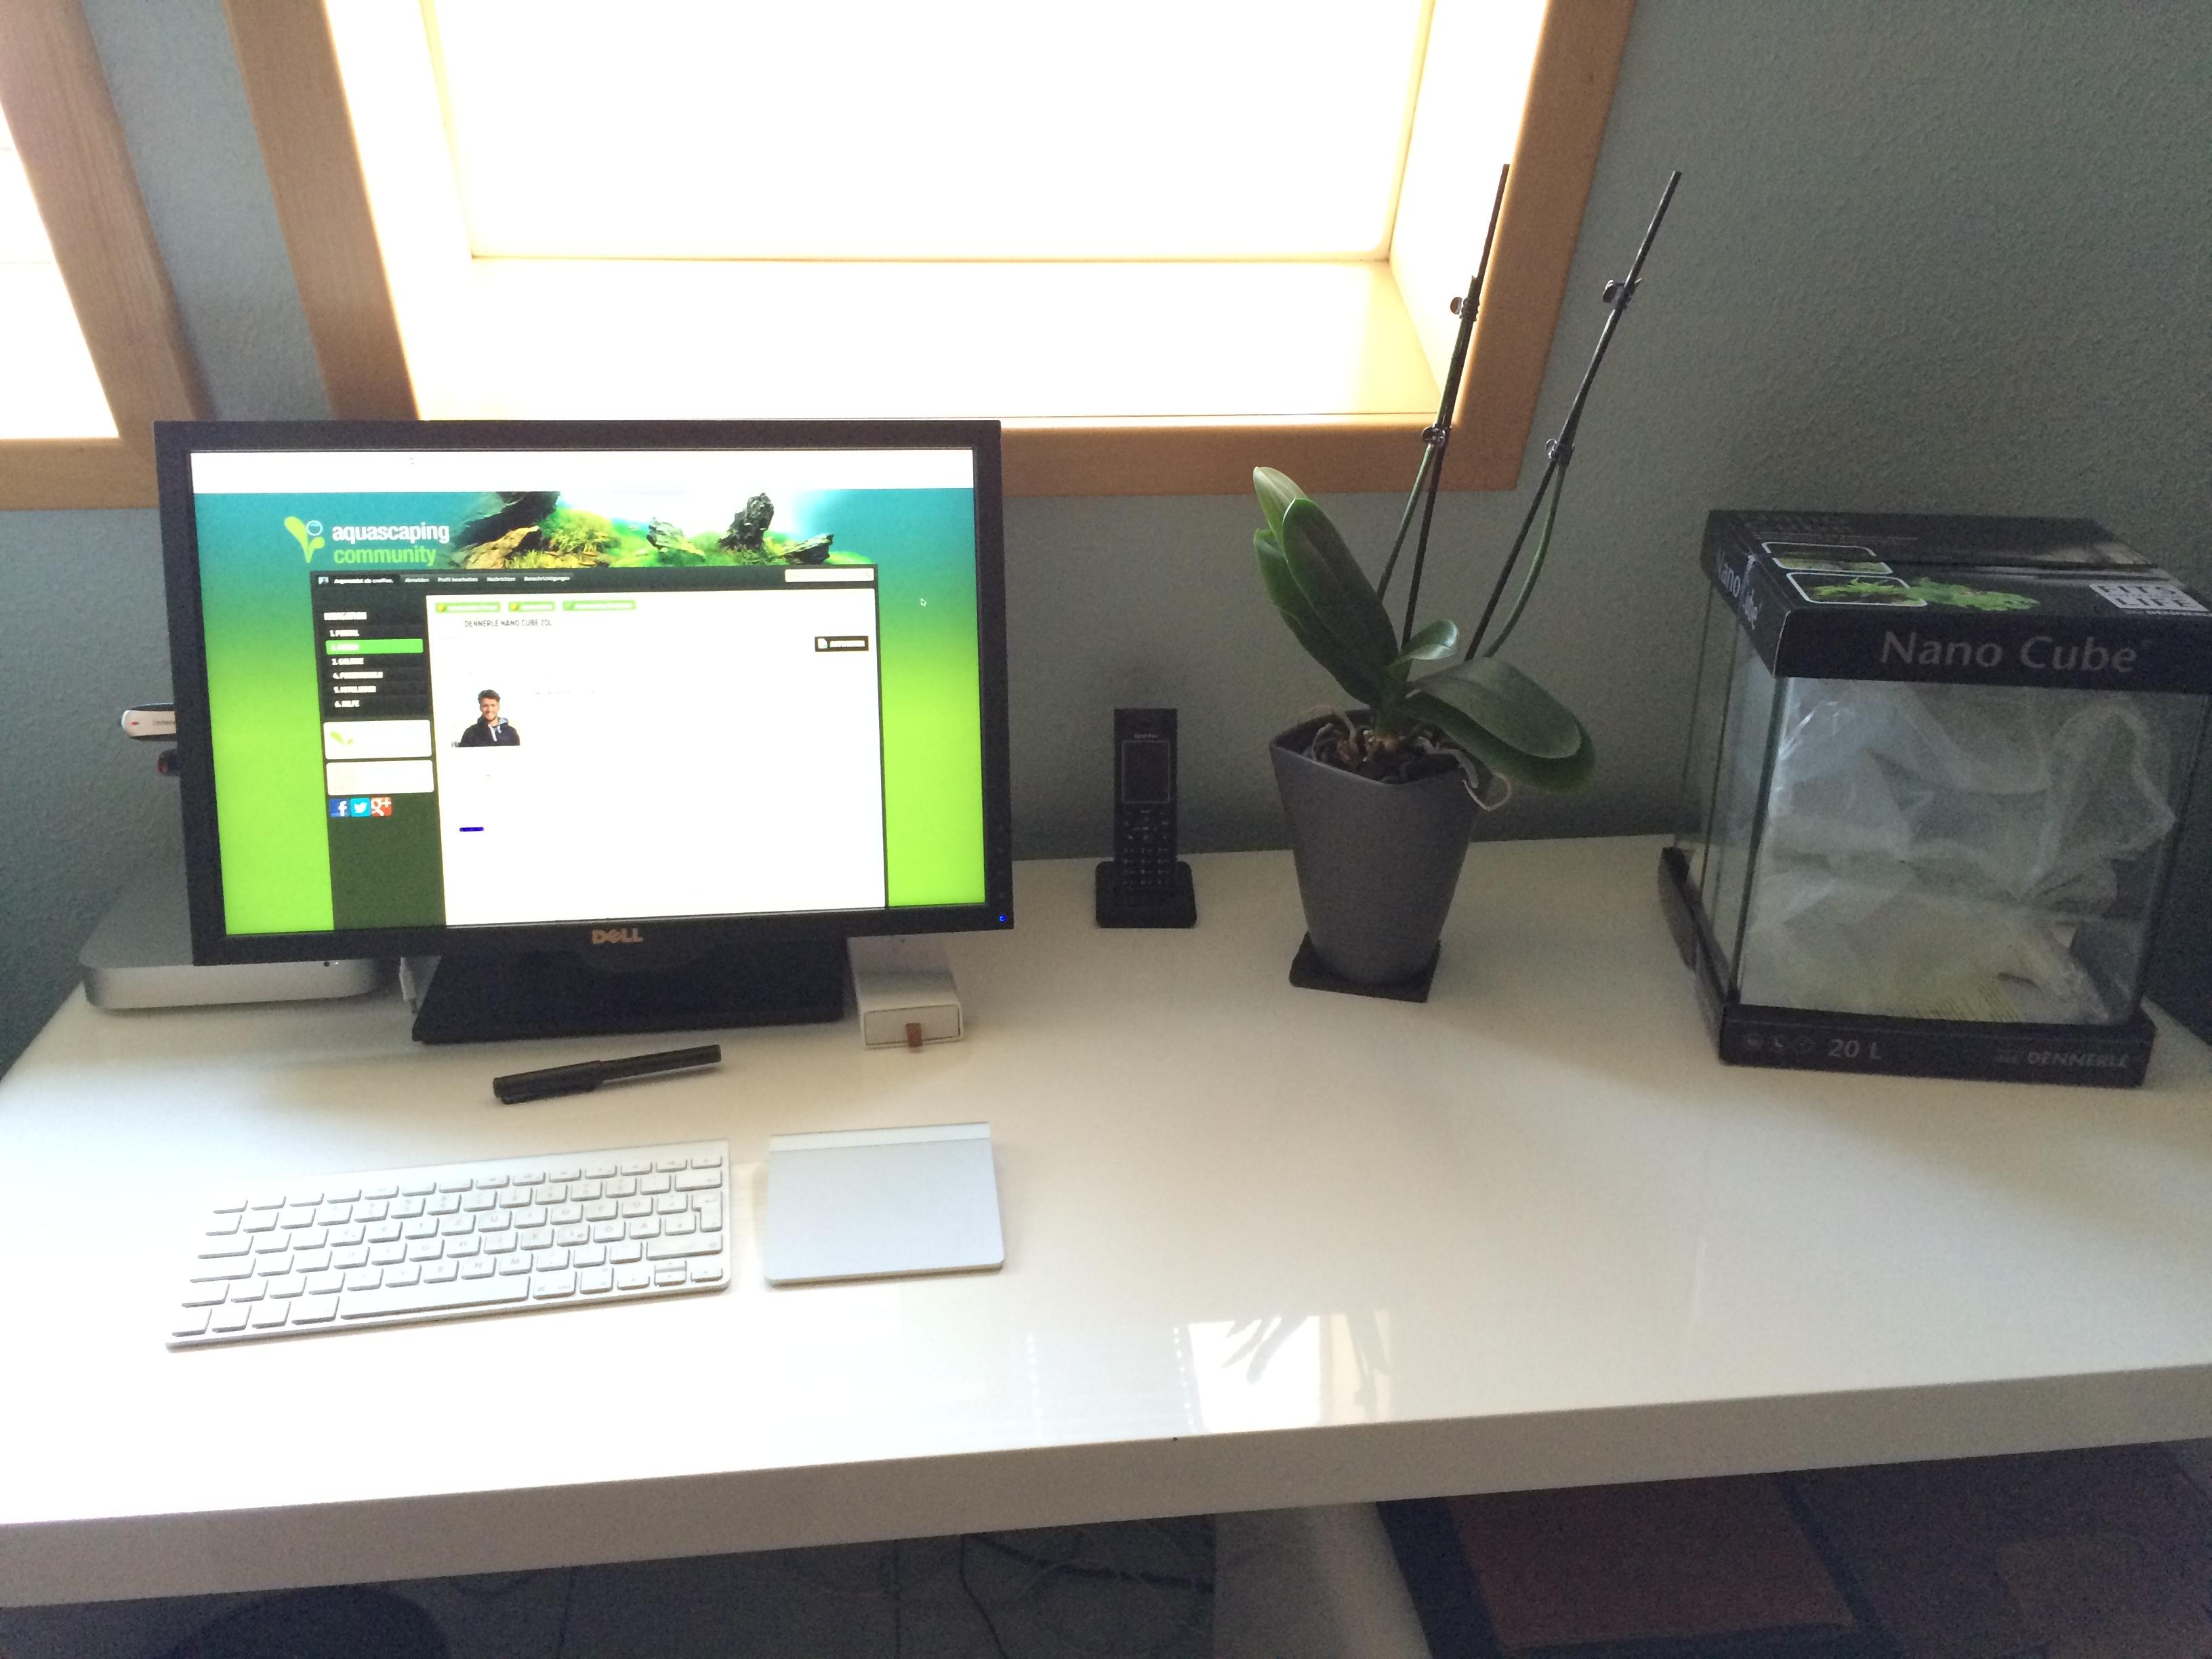 dennerle nano cube 20l aquascaping einsteiger aquascaping forum. Black Bedroom Furniture Sets. Home Design Ideas